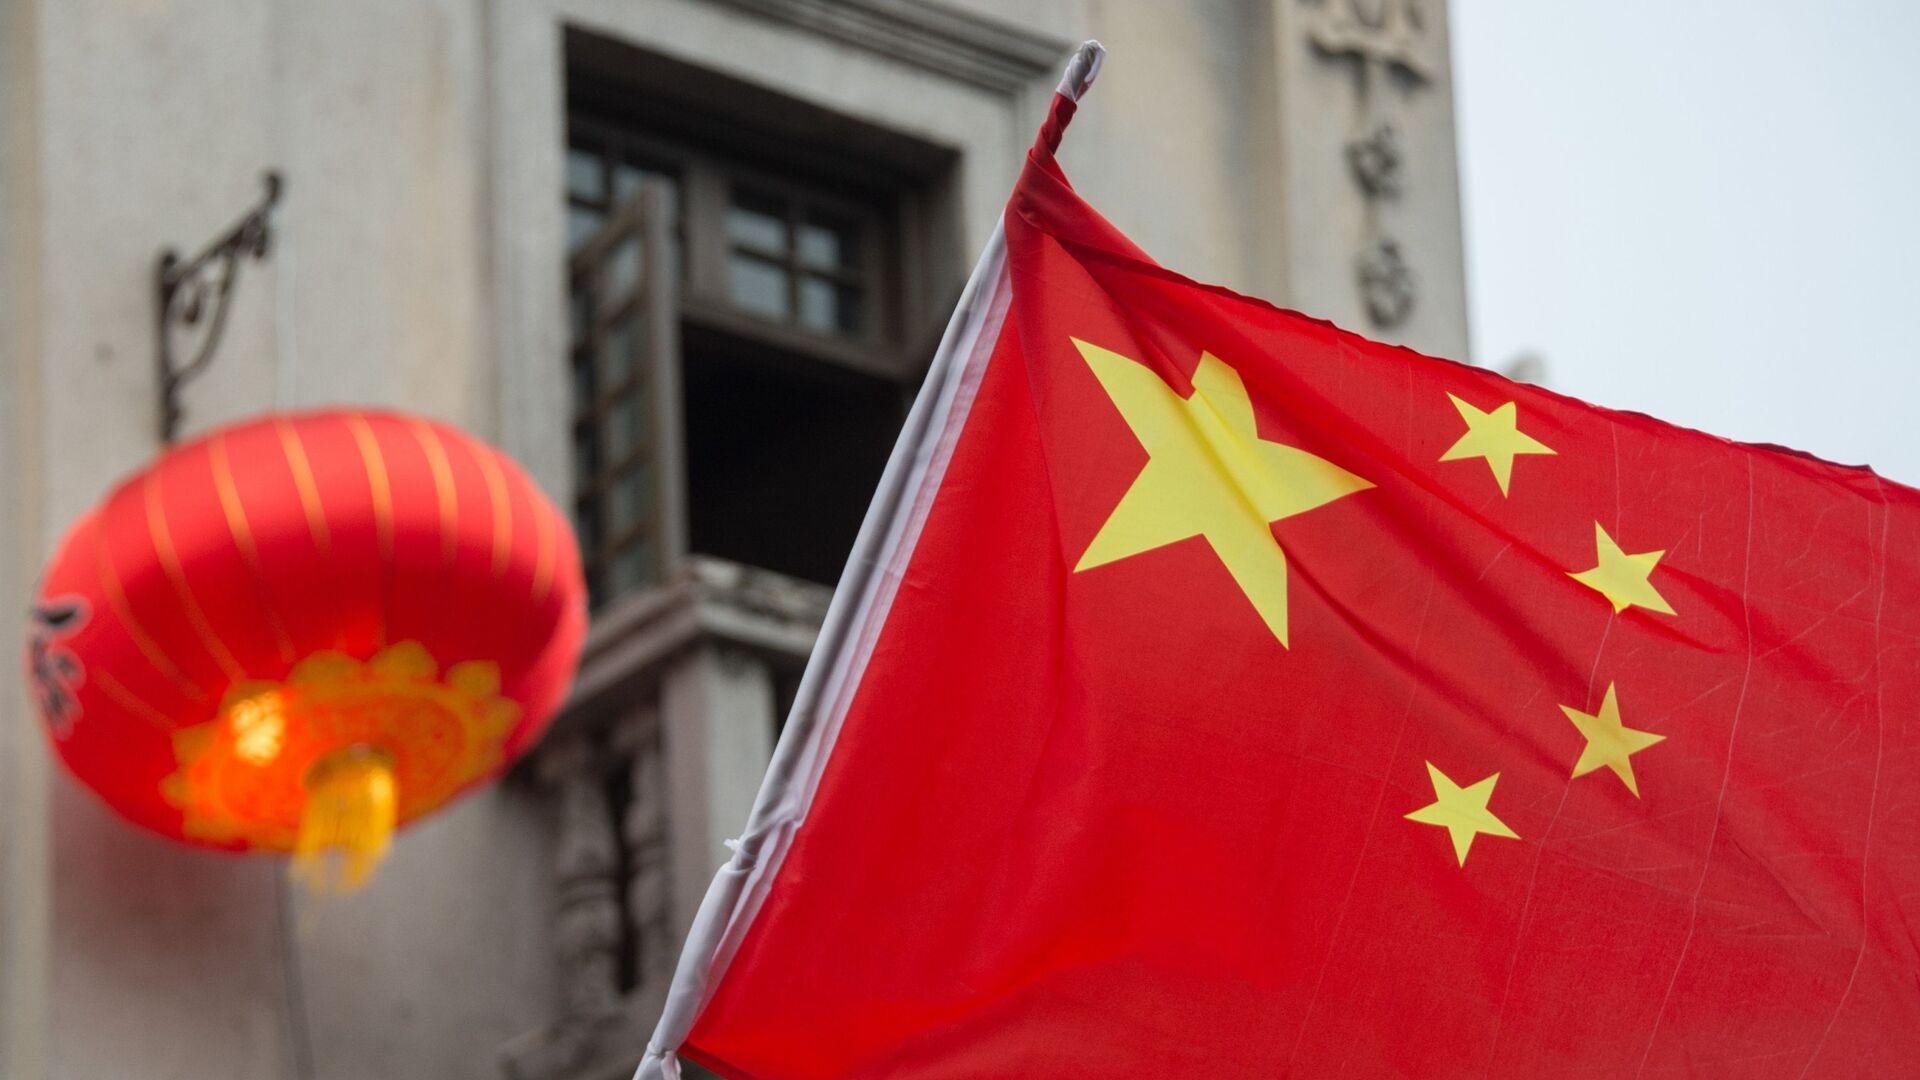 La bandera de China - Sputnik Mundo, 1920, 12.01.2021